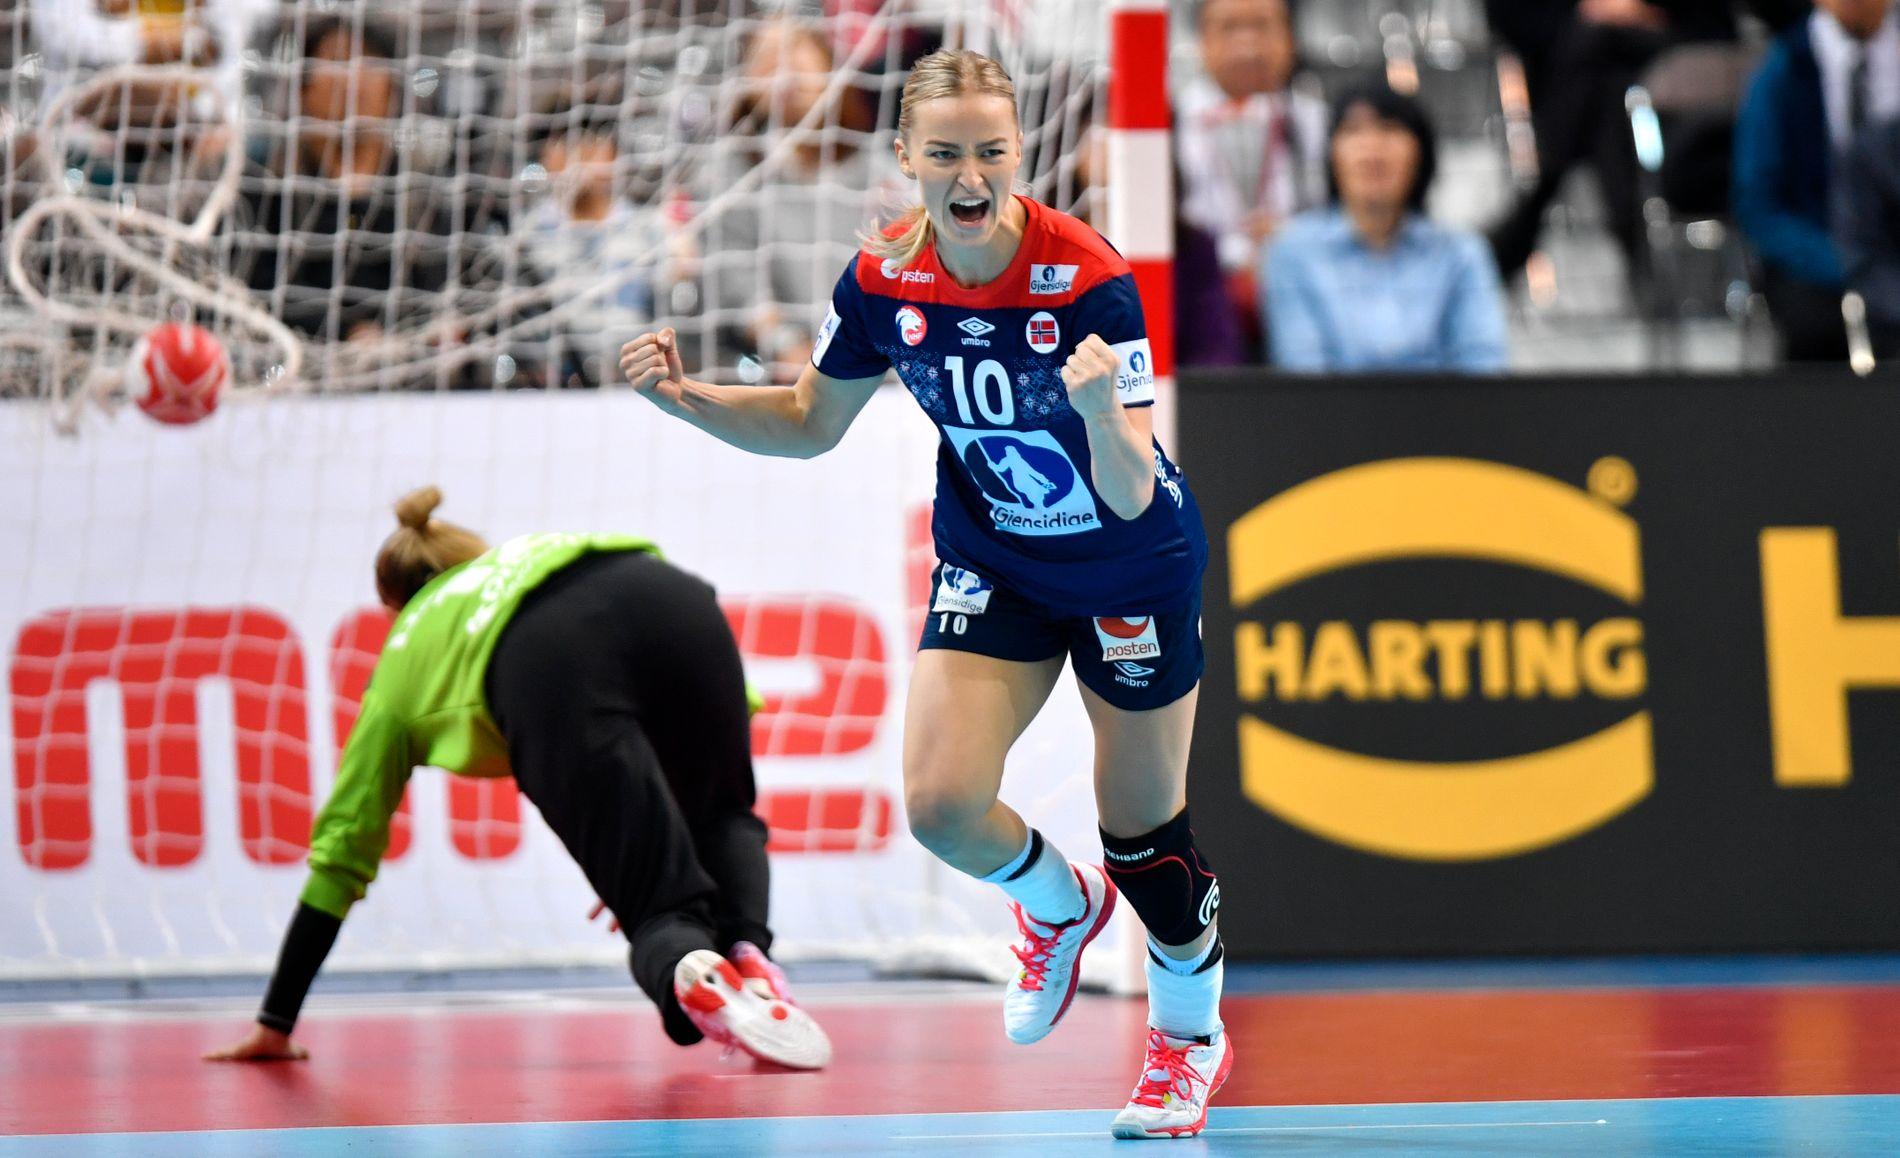 Handball Halbfinale übertragung